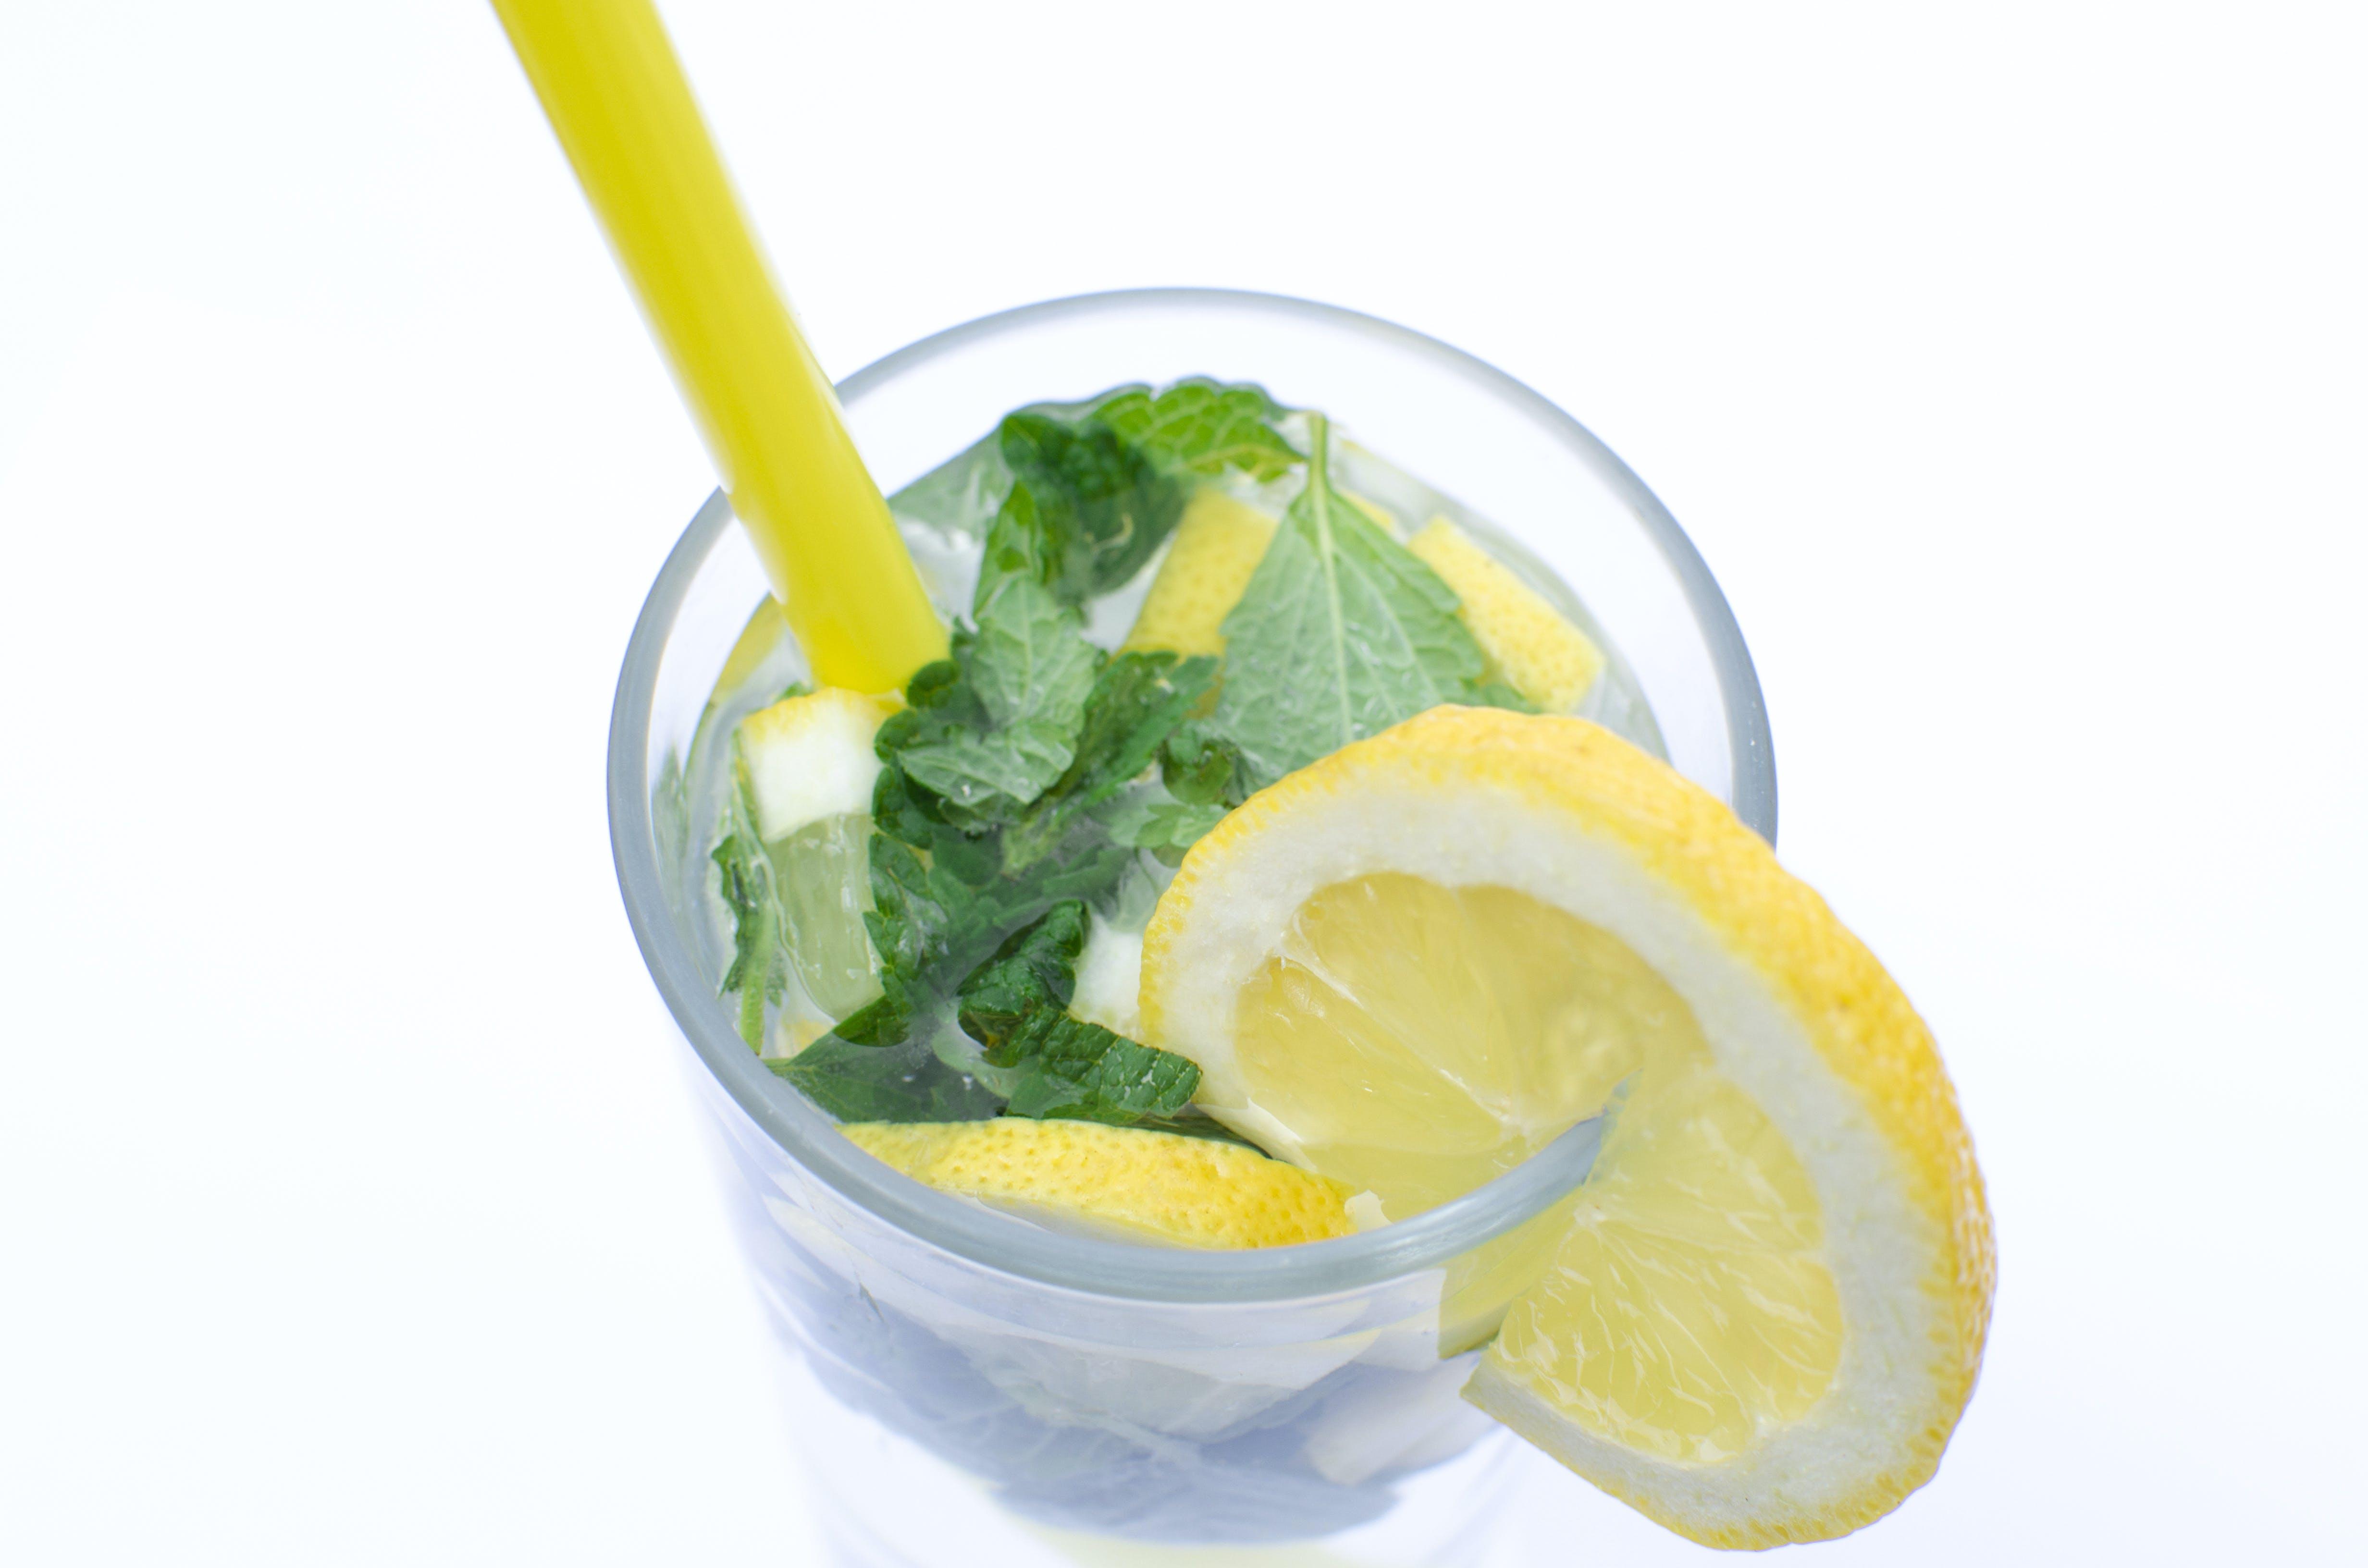 Lemon Juice in Cup